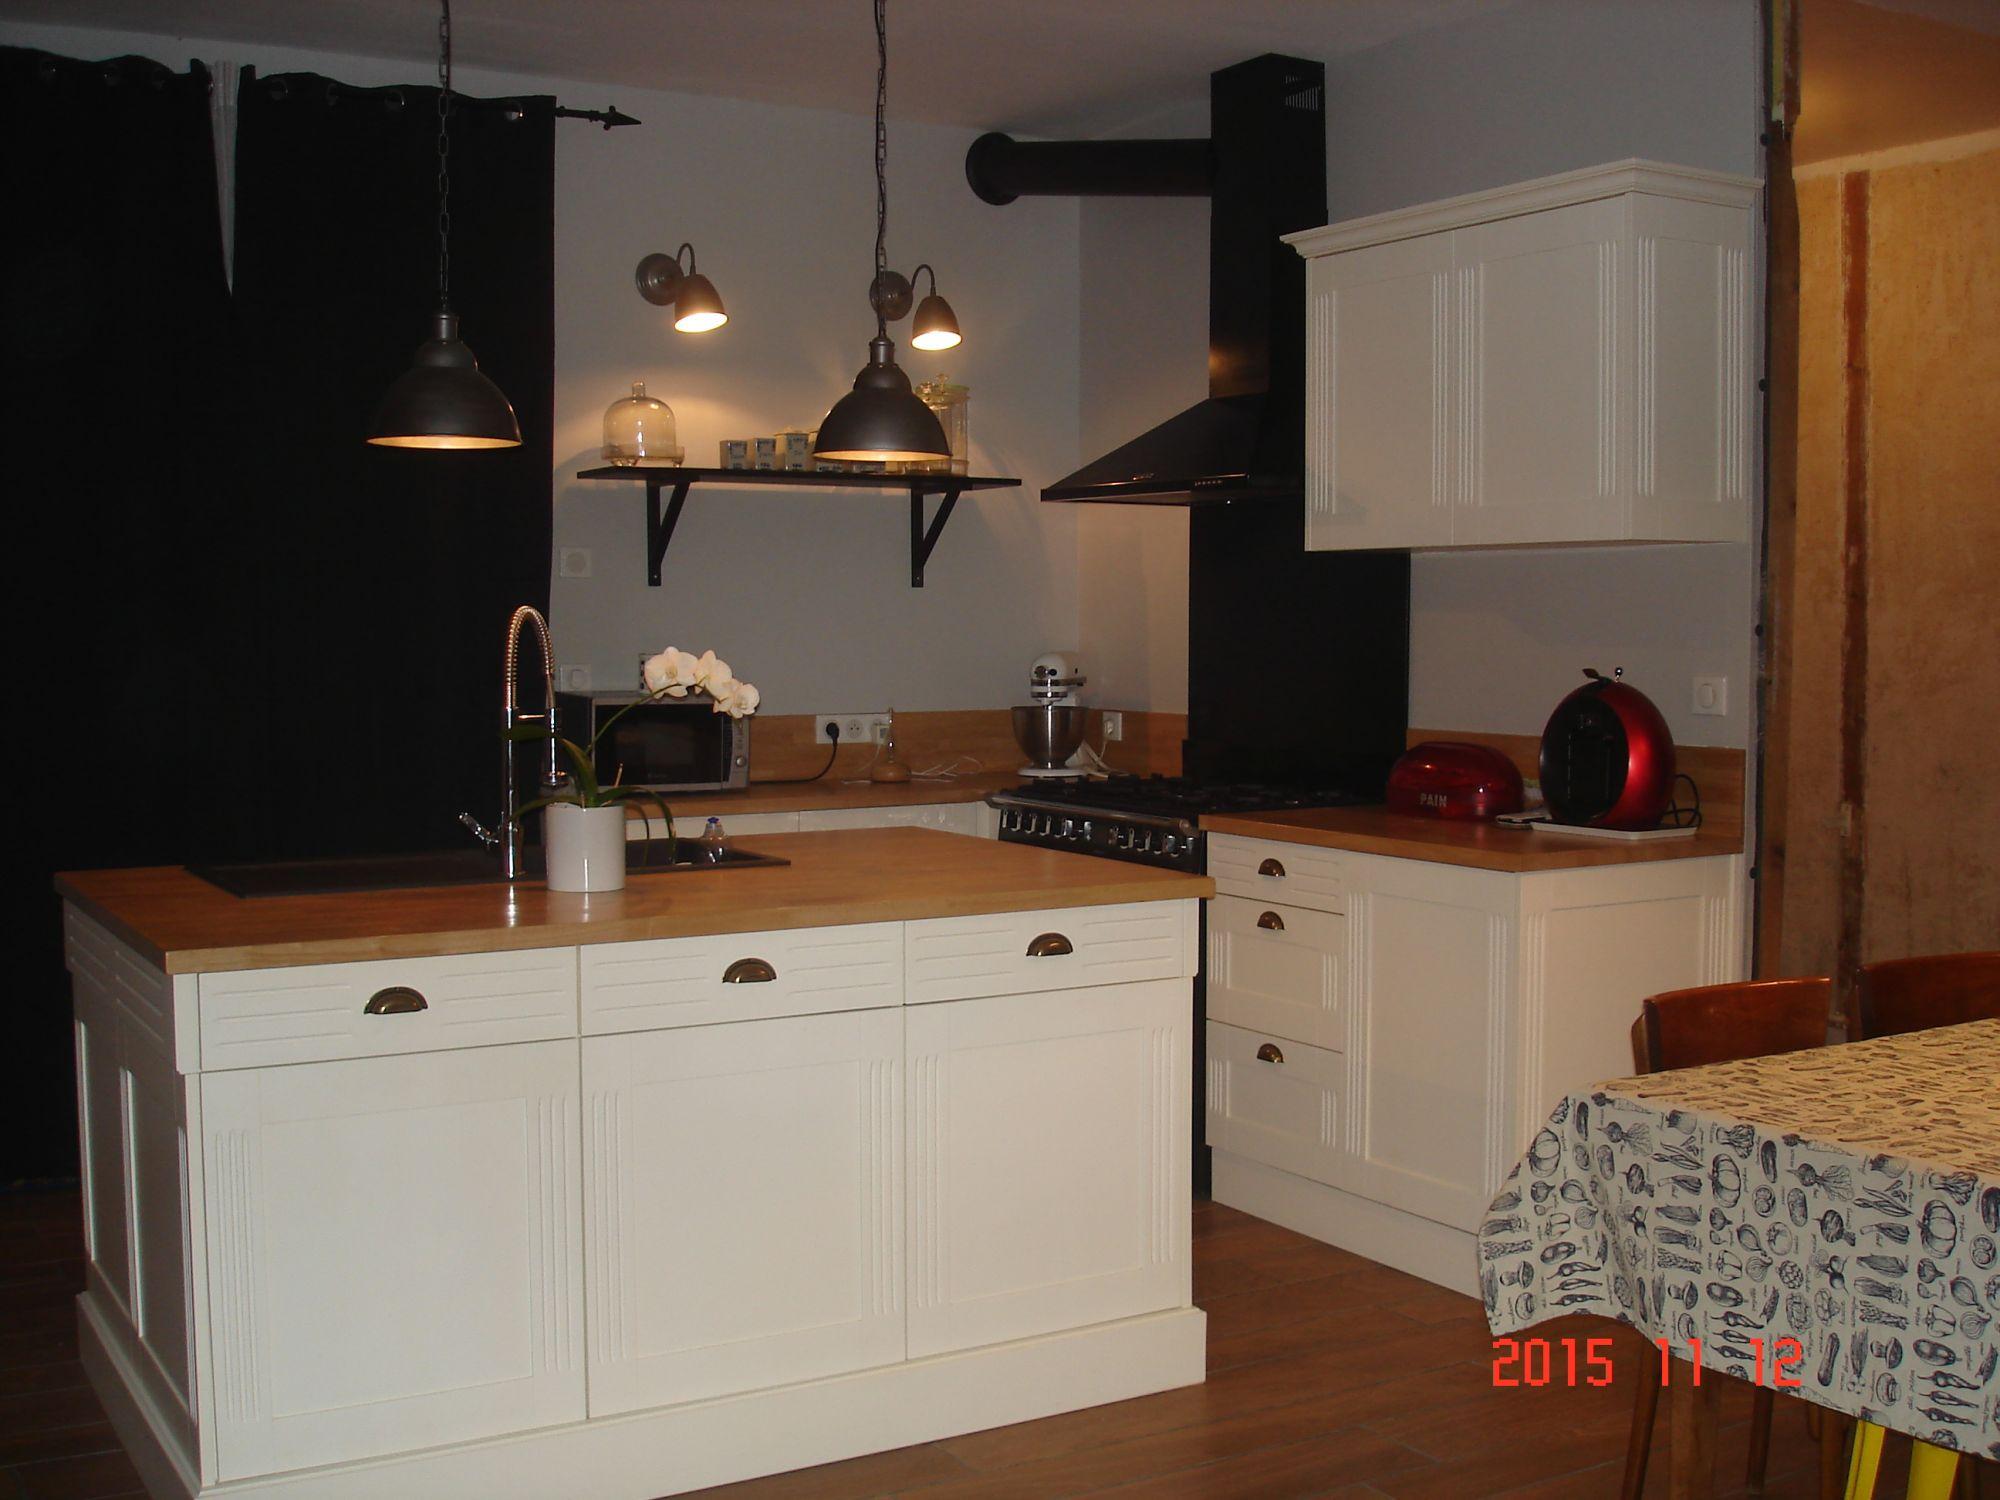 pose de cuisine mbl 86 menuiserie amberre 86. Black Bedroom Furniture Sets. Home Design Ideas